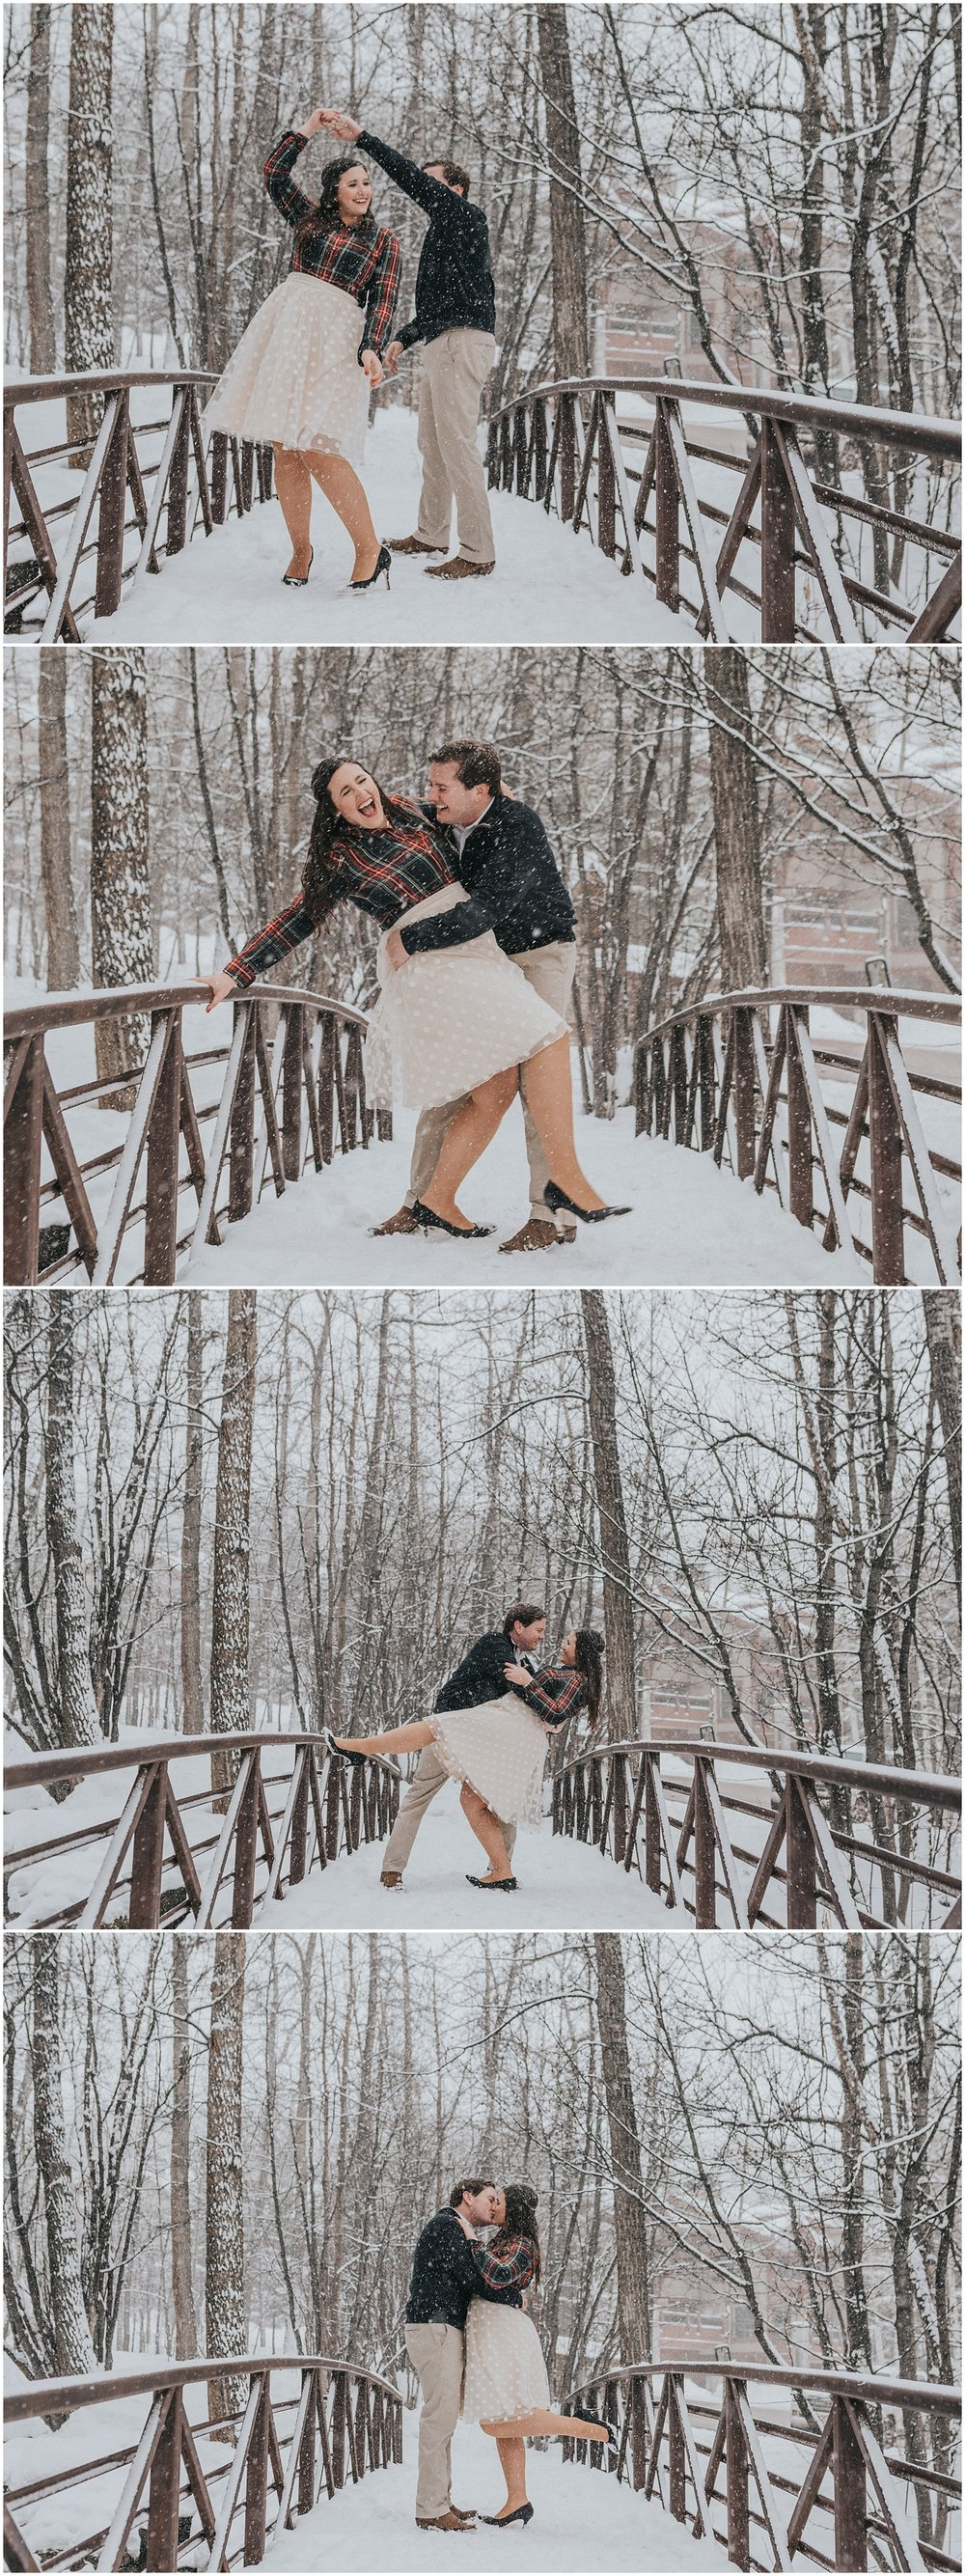 beavercreek_colorado_winter_engagement_photos_0008.jpg